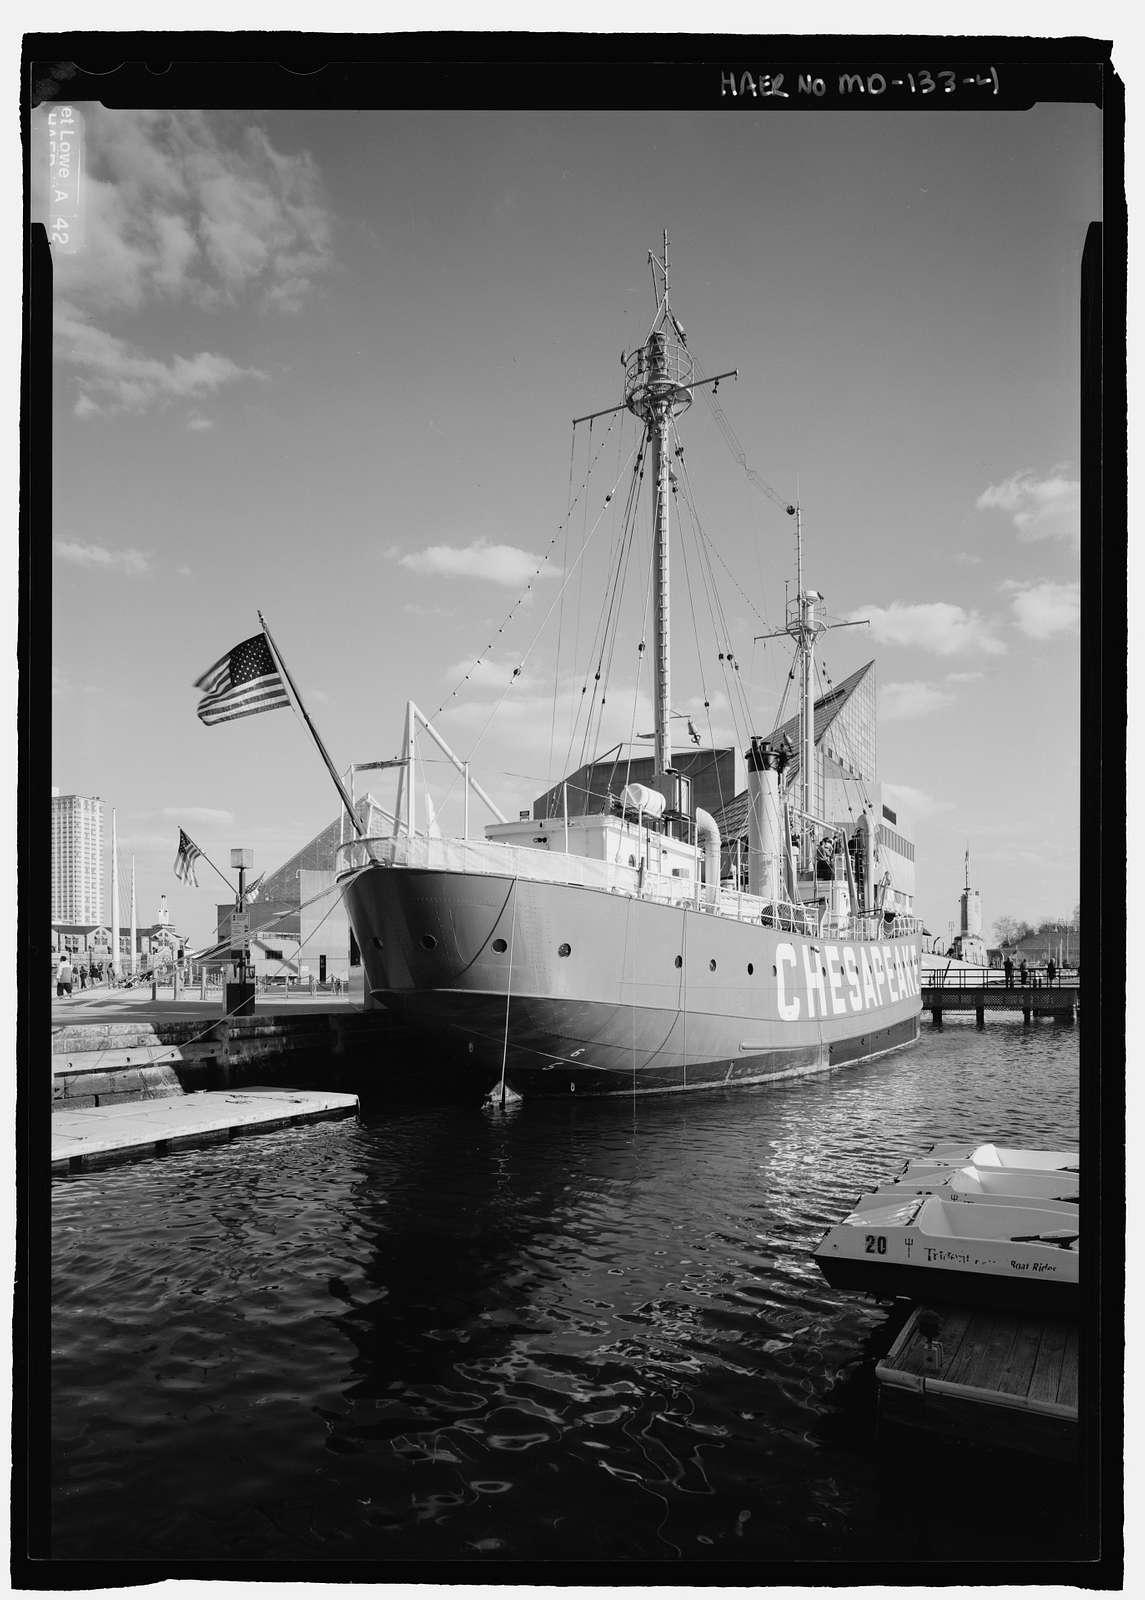 Lightship 116, Pier 3, Inner Harbor, Baltimore, Independent City, MD